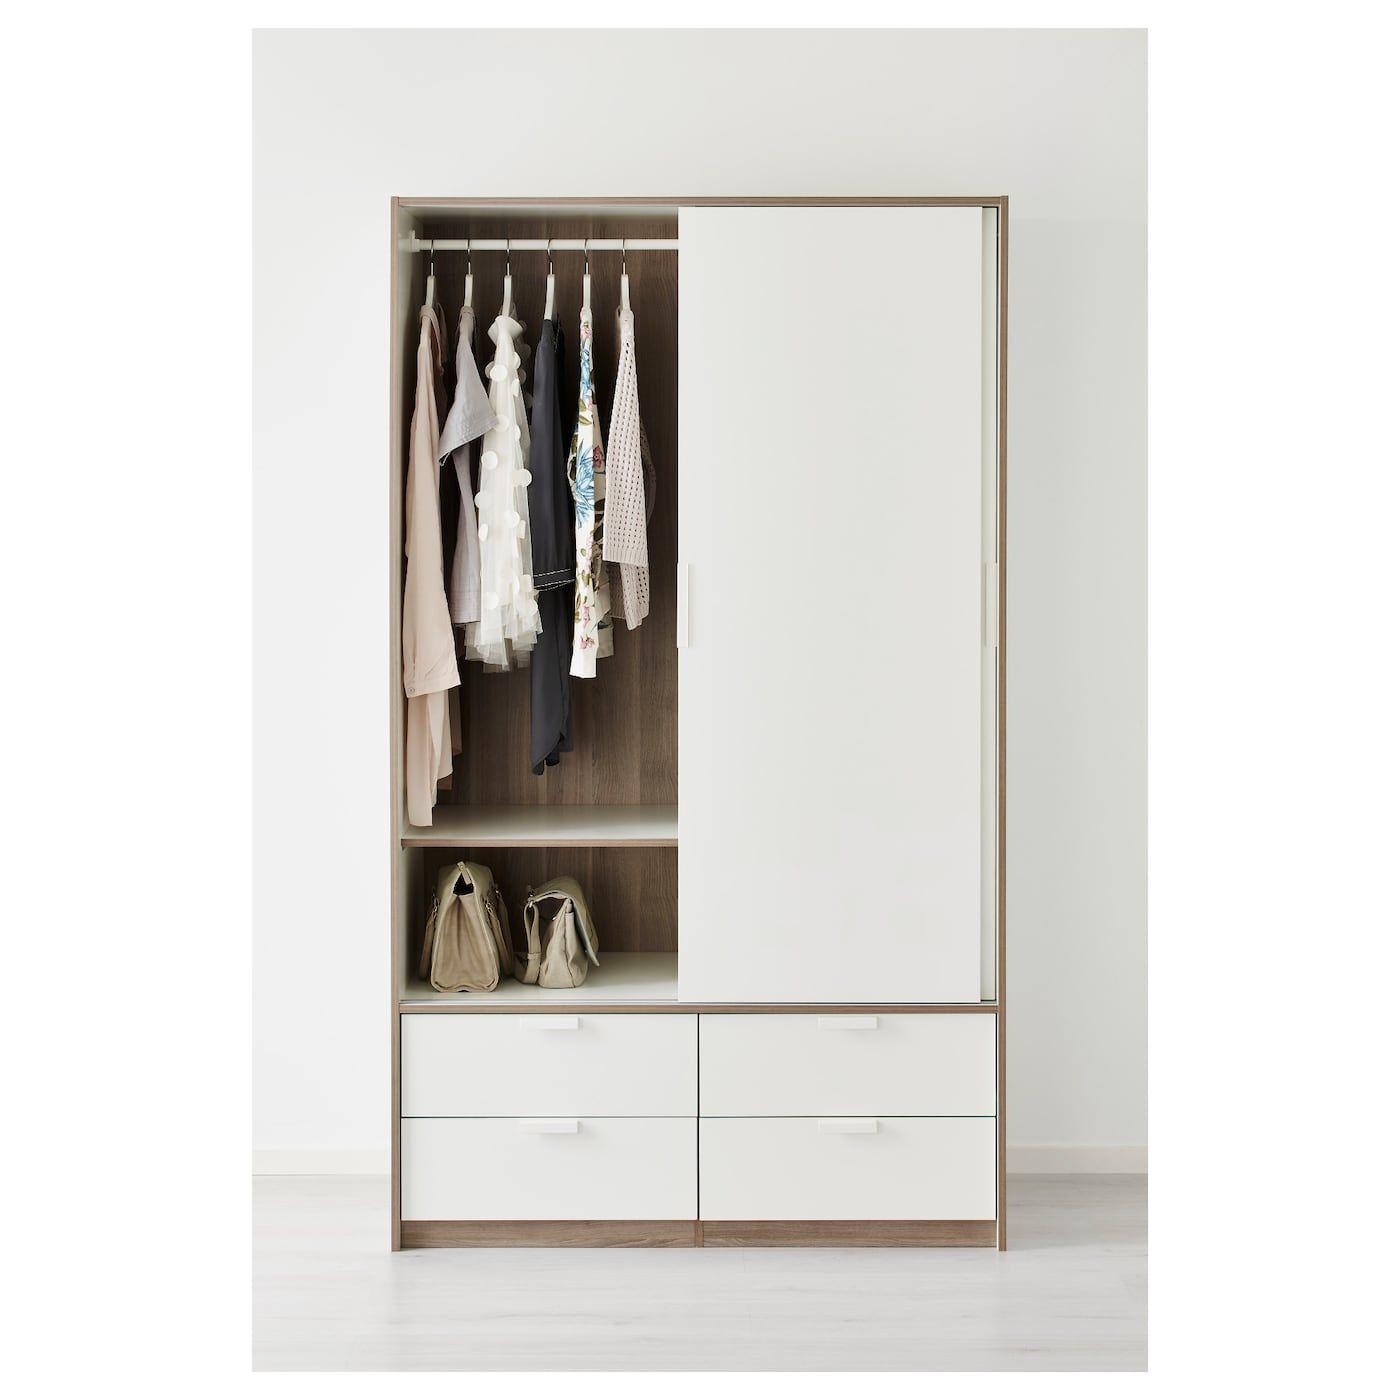 Kledingkast Met Lades.Trysil Kledingkast Schuifdeuren 4 Lades Wit In 2019 Ikea